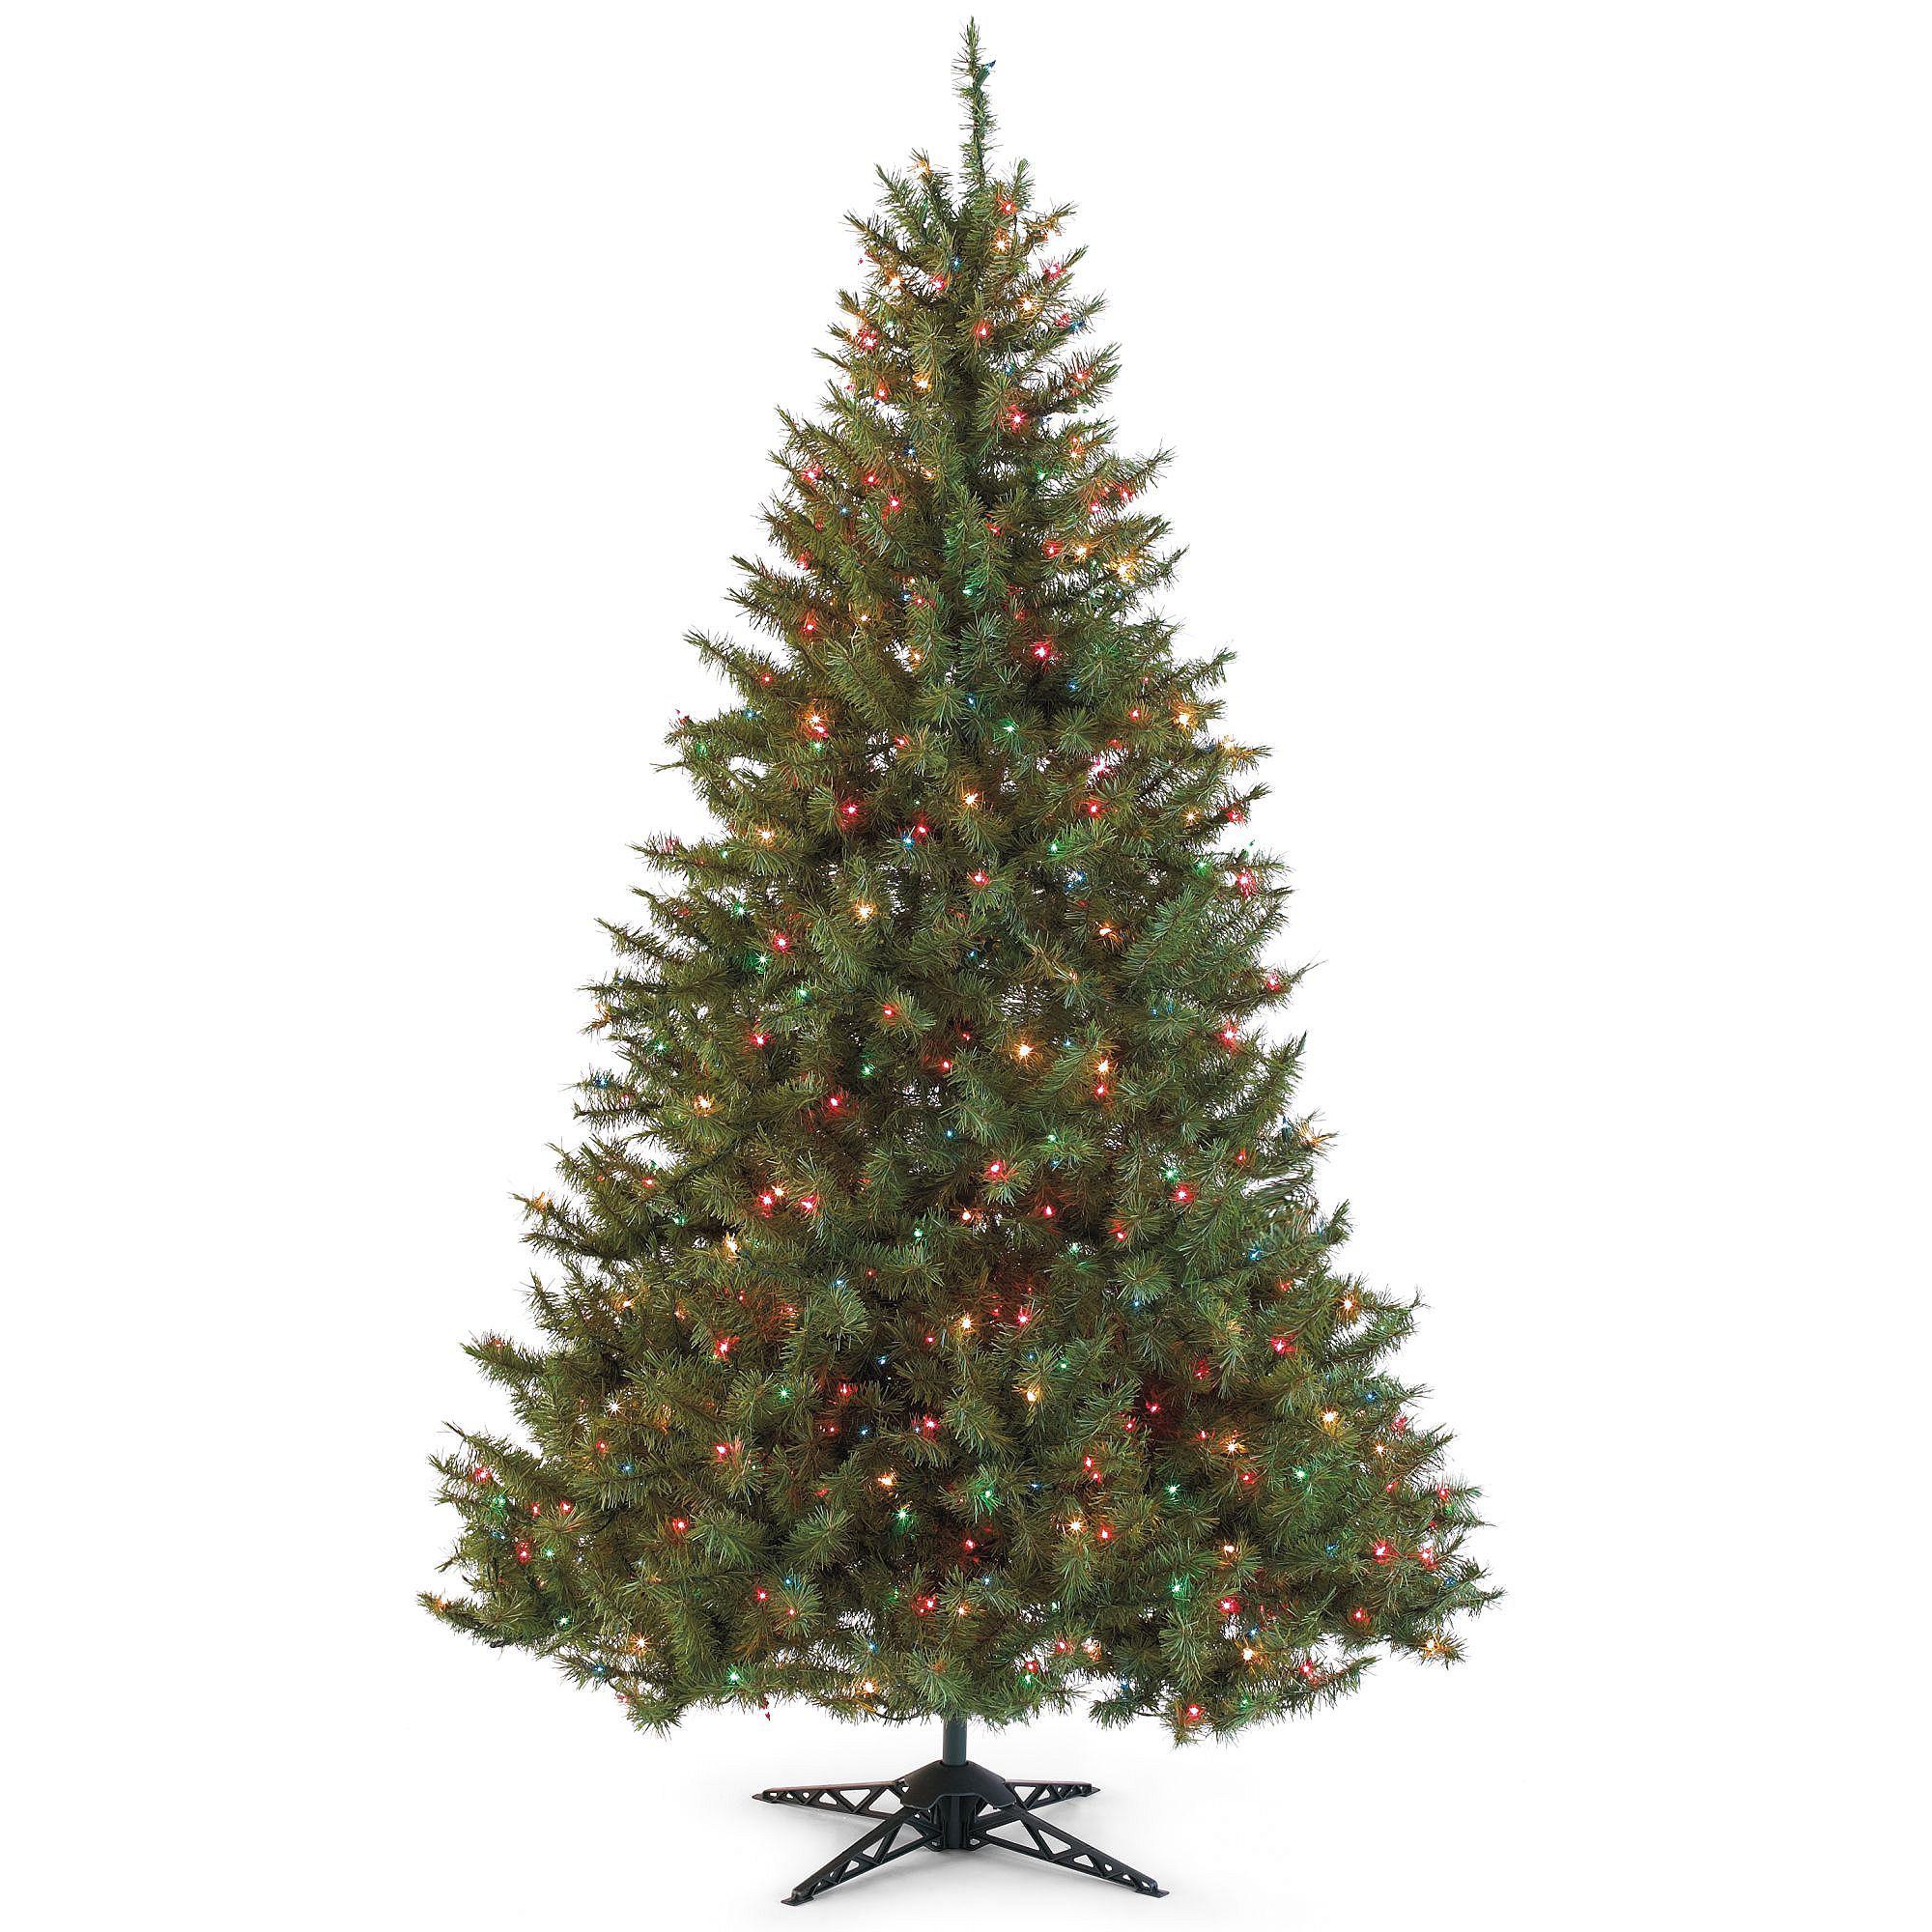 9 Foot Christmas Tree Buy 9 Ft Artificial Christmas